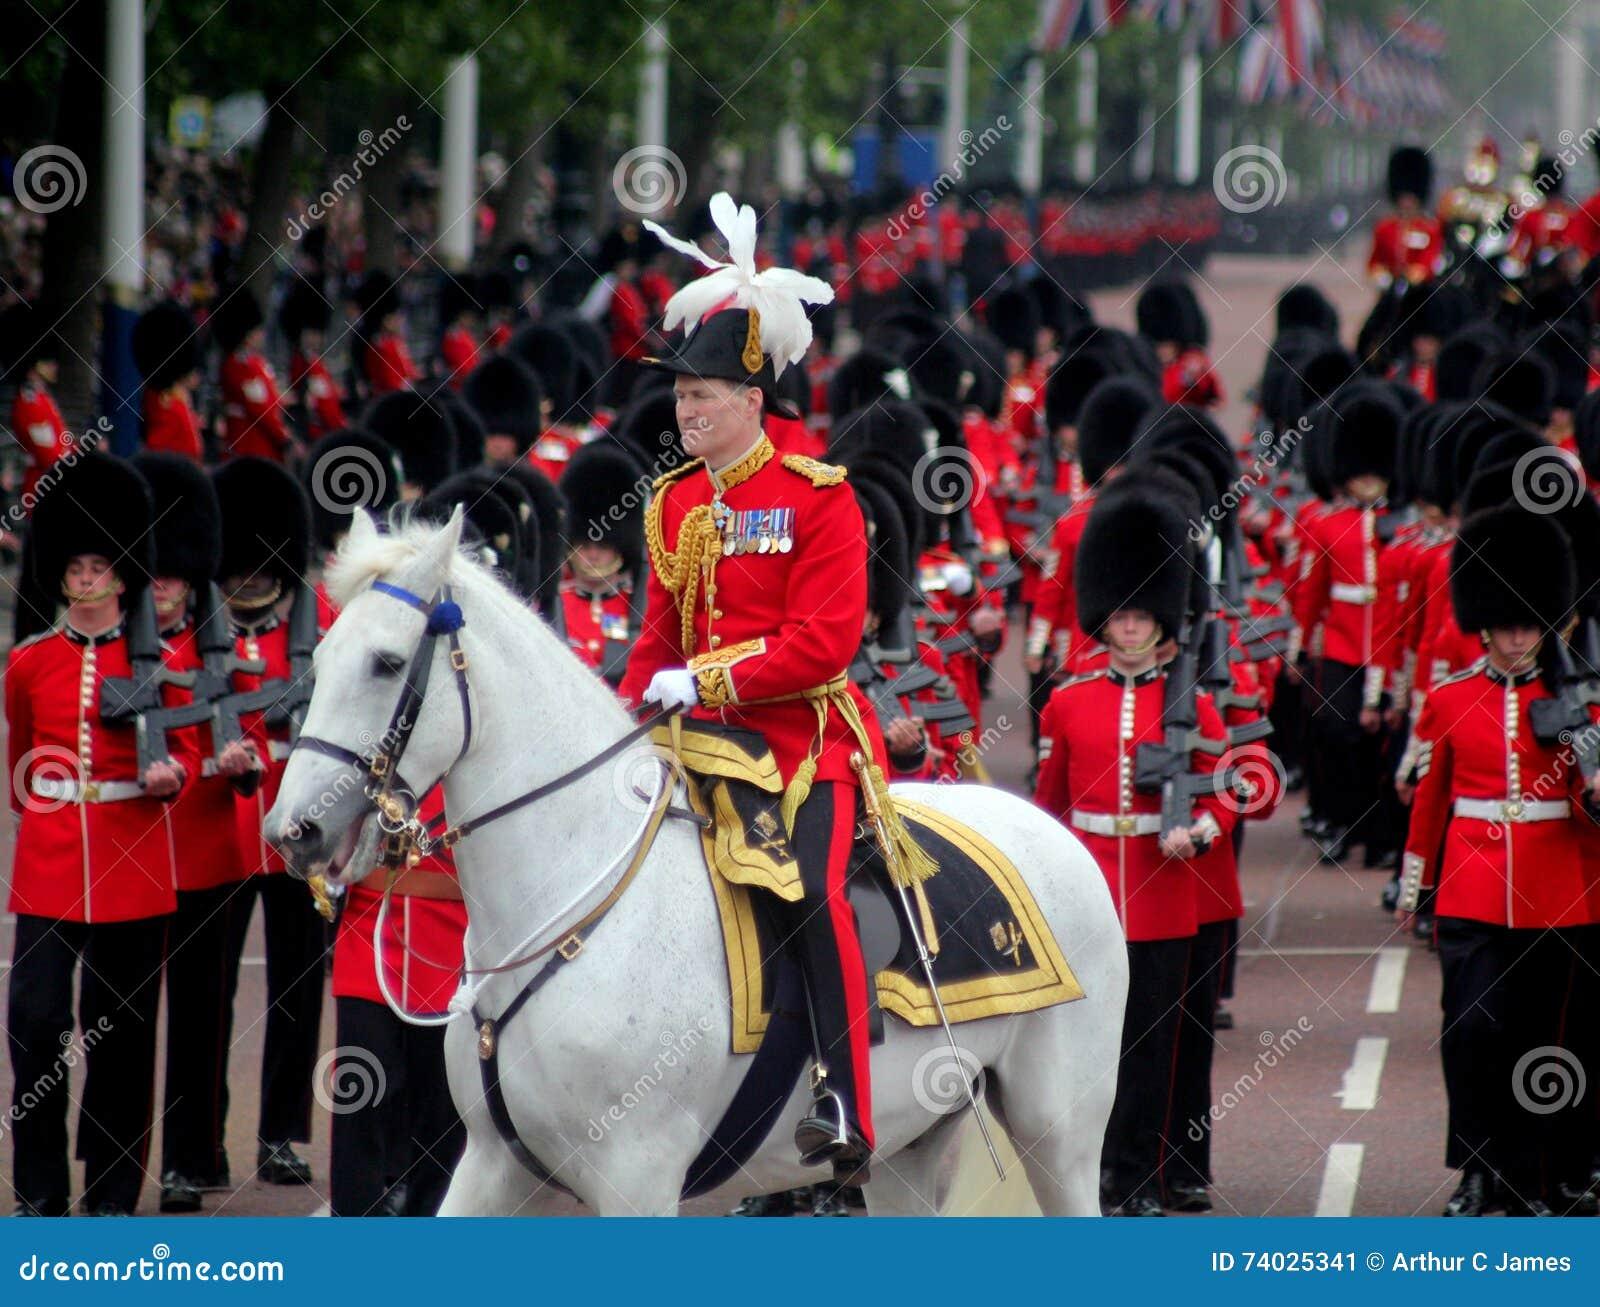 Major London